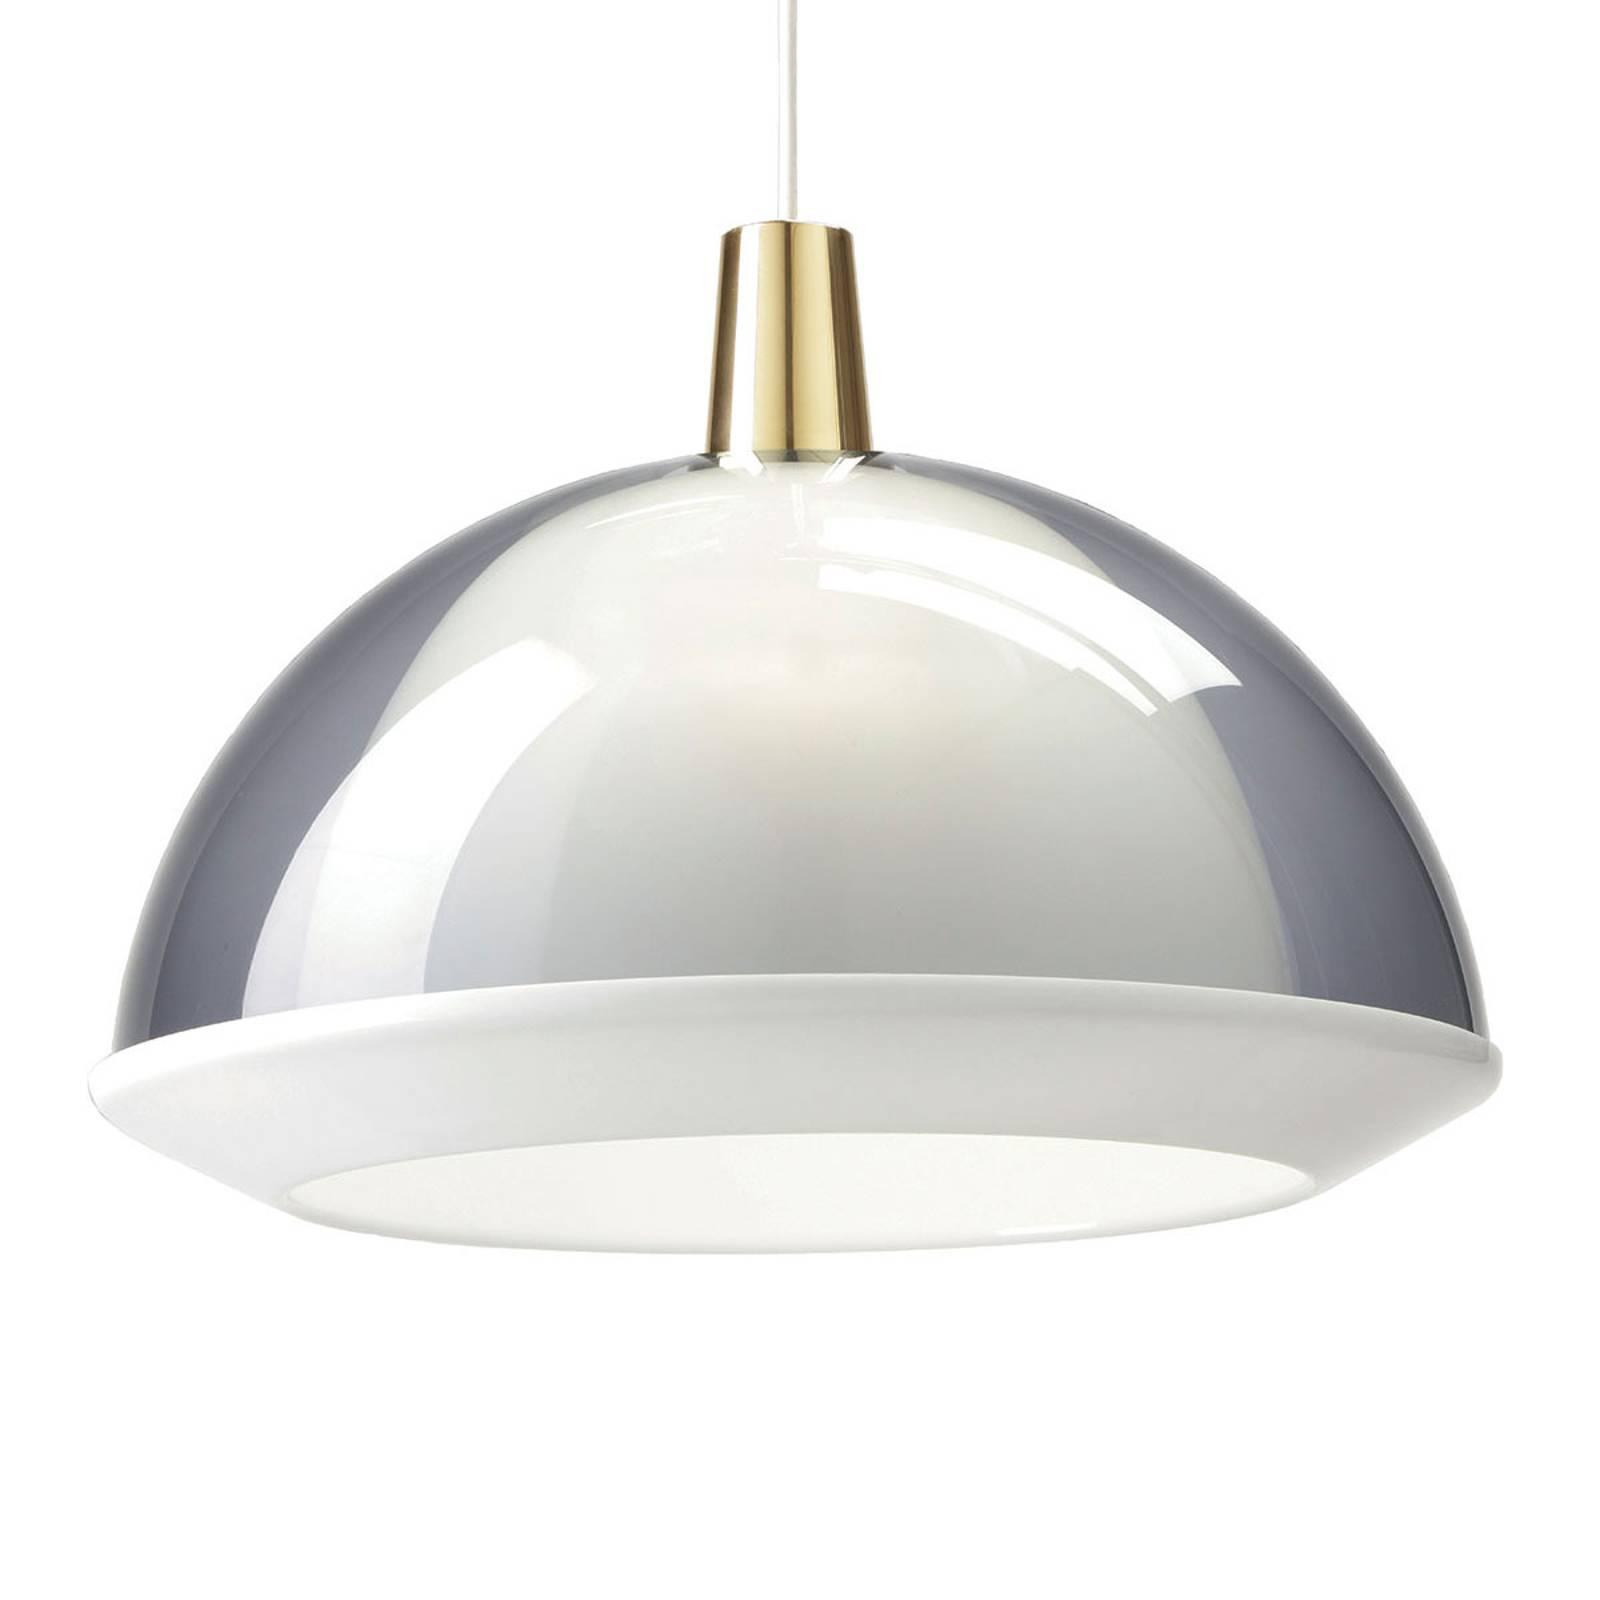 Innolux Kuplat 480 hanglamp 48 cm rookgrijs